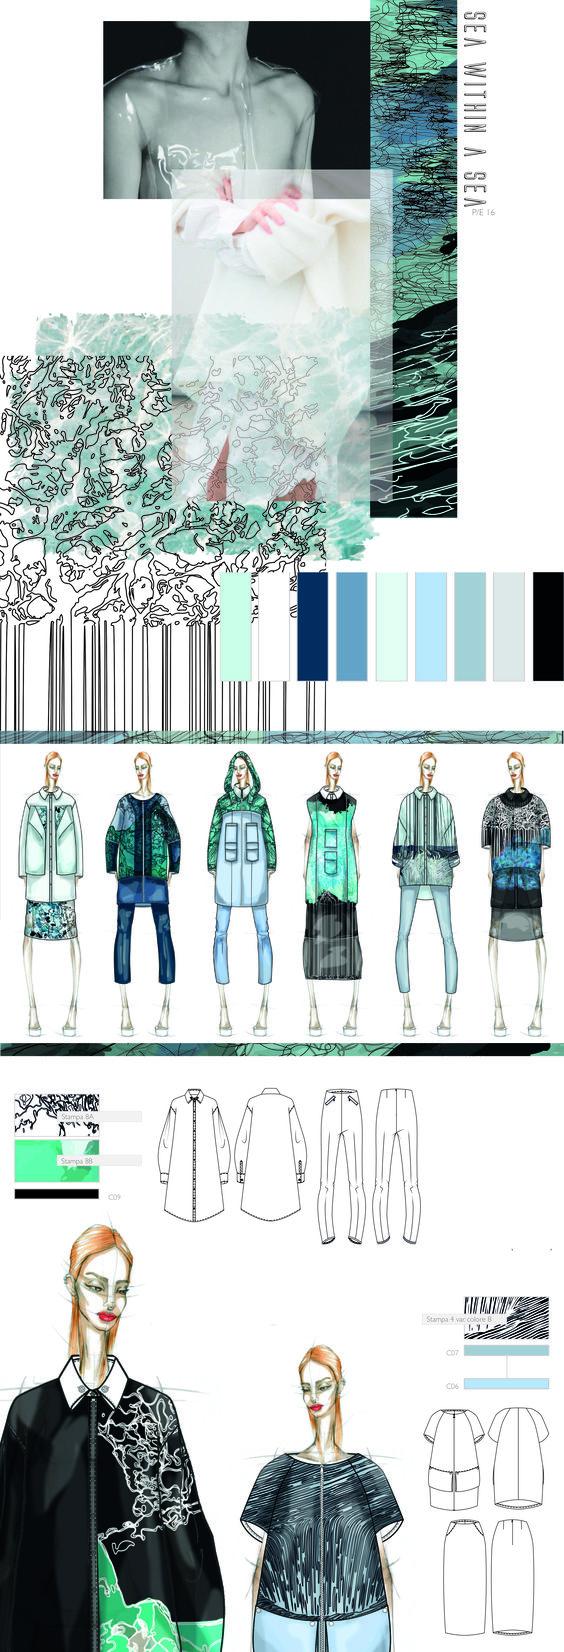 Fashion Sketchbook - fashion illustrations; fashion design development; fashion portfolio // Valeria Pulici